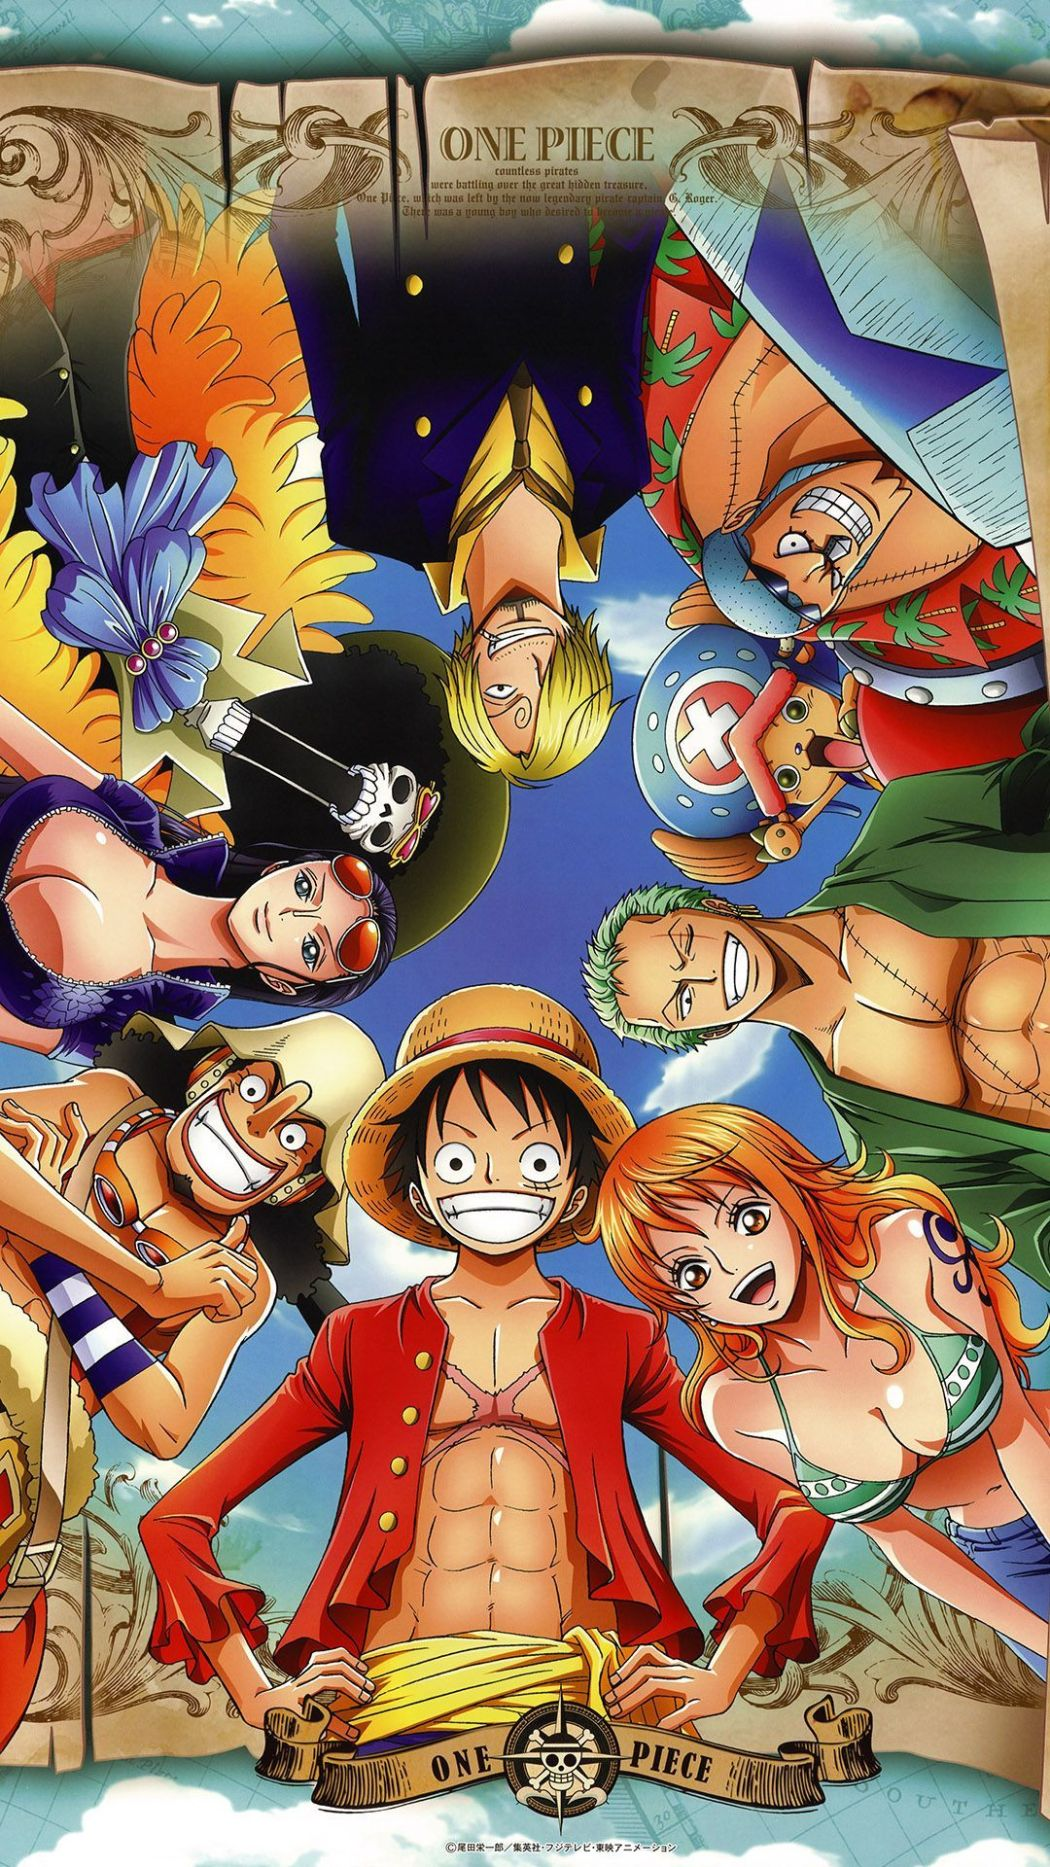 One Piece anime visual haruhichan.com One Piece anime